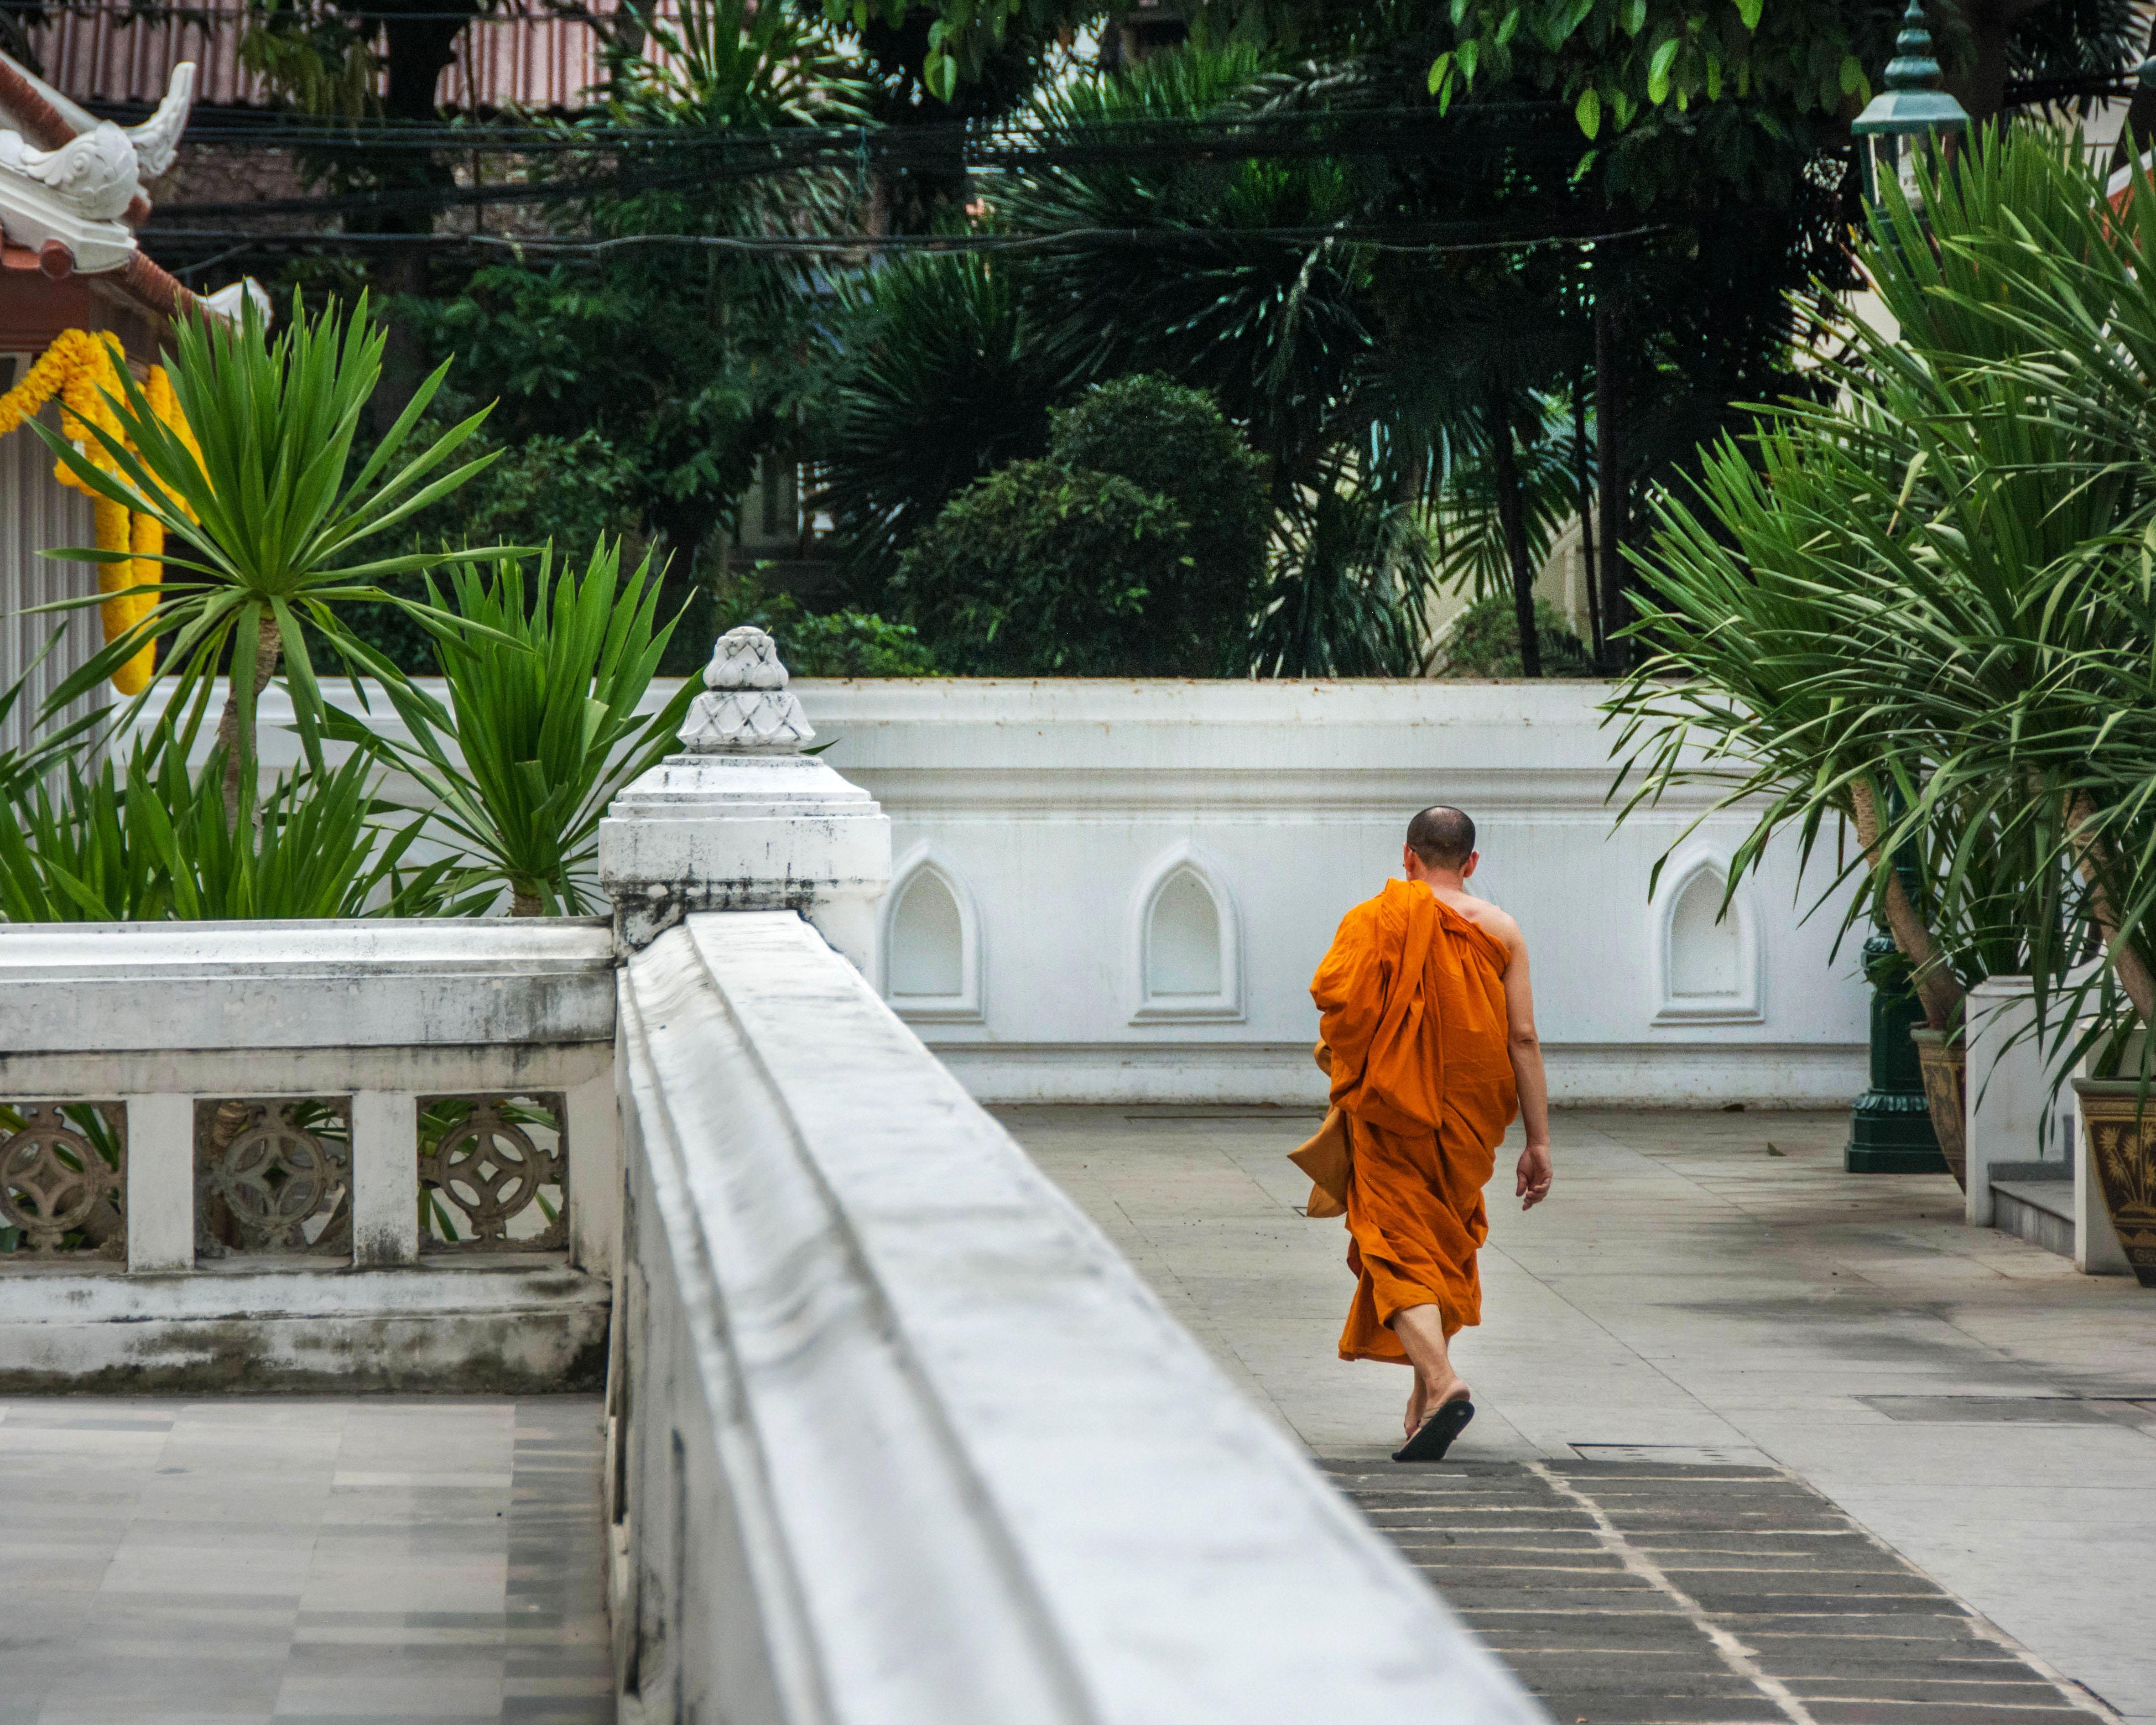 Temple.Monk